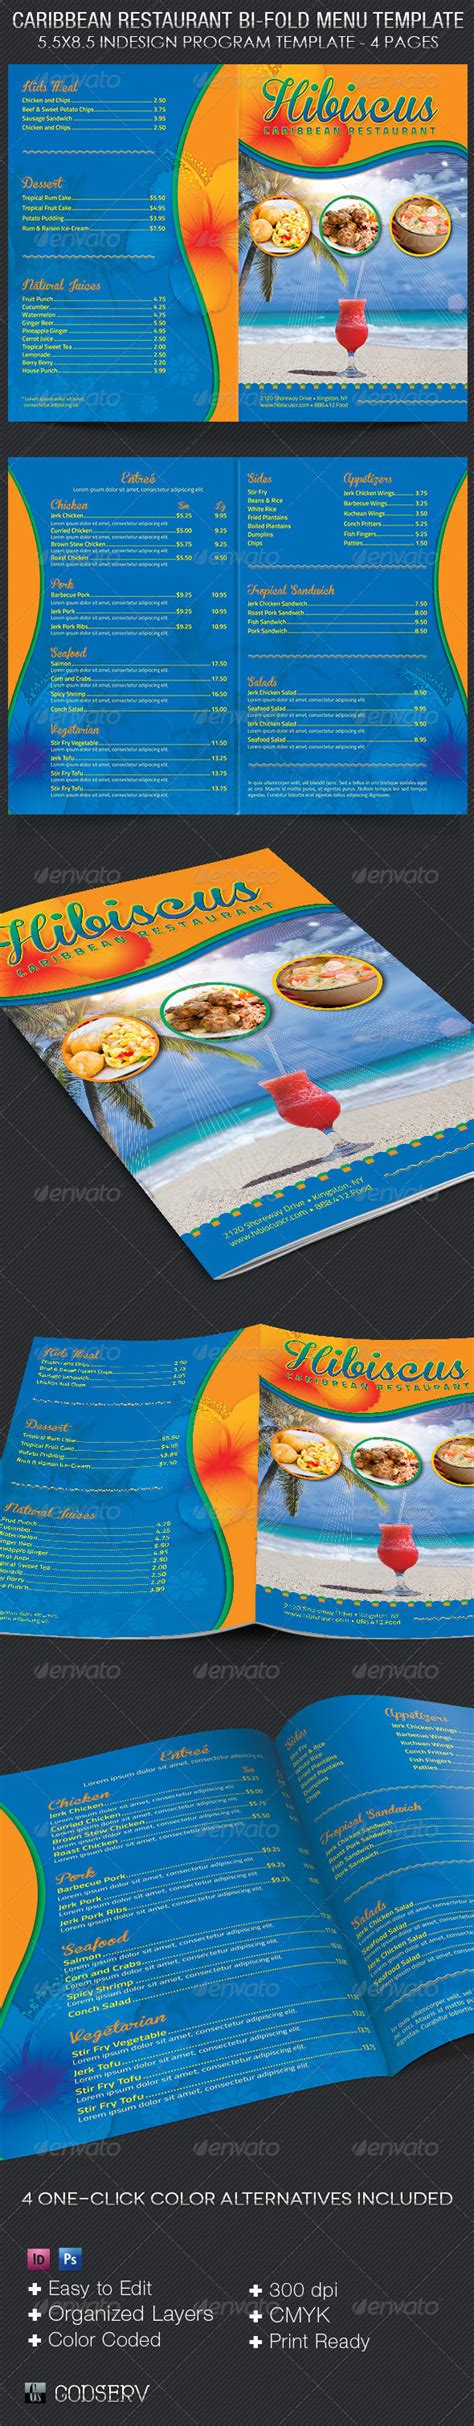 Caribbean Restaurant Bi Fold Menu Template On Behance Free Caribbean Menu Template